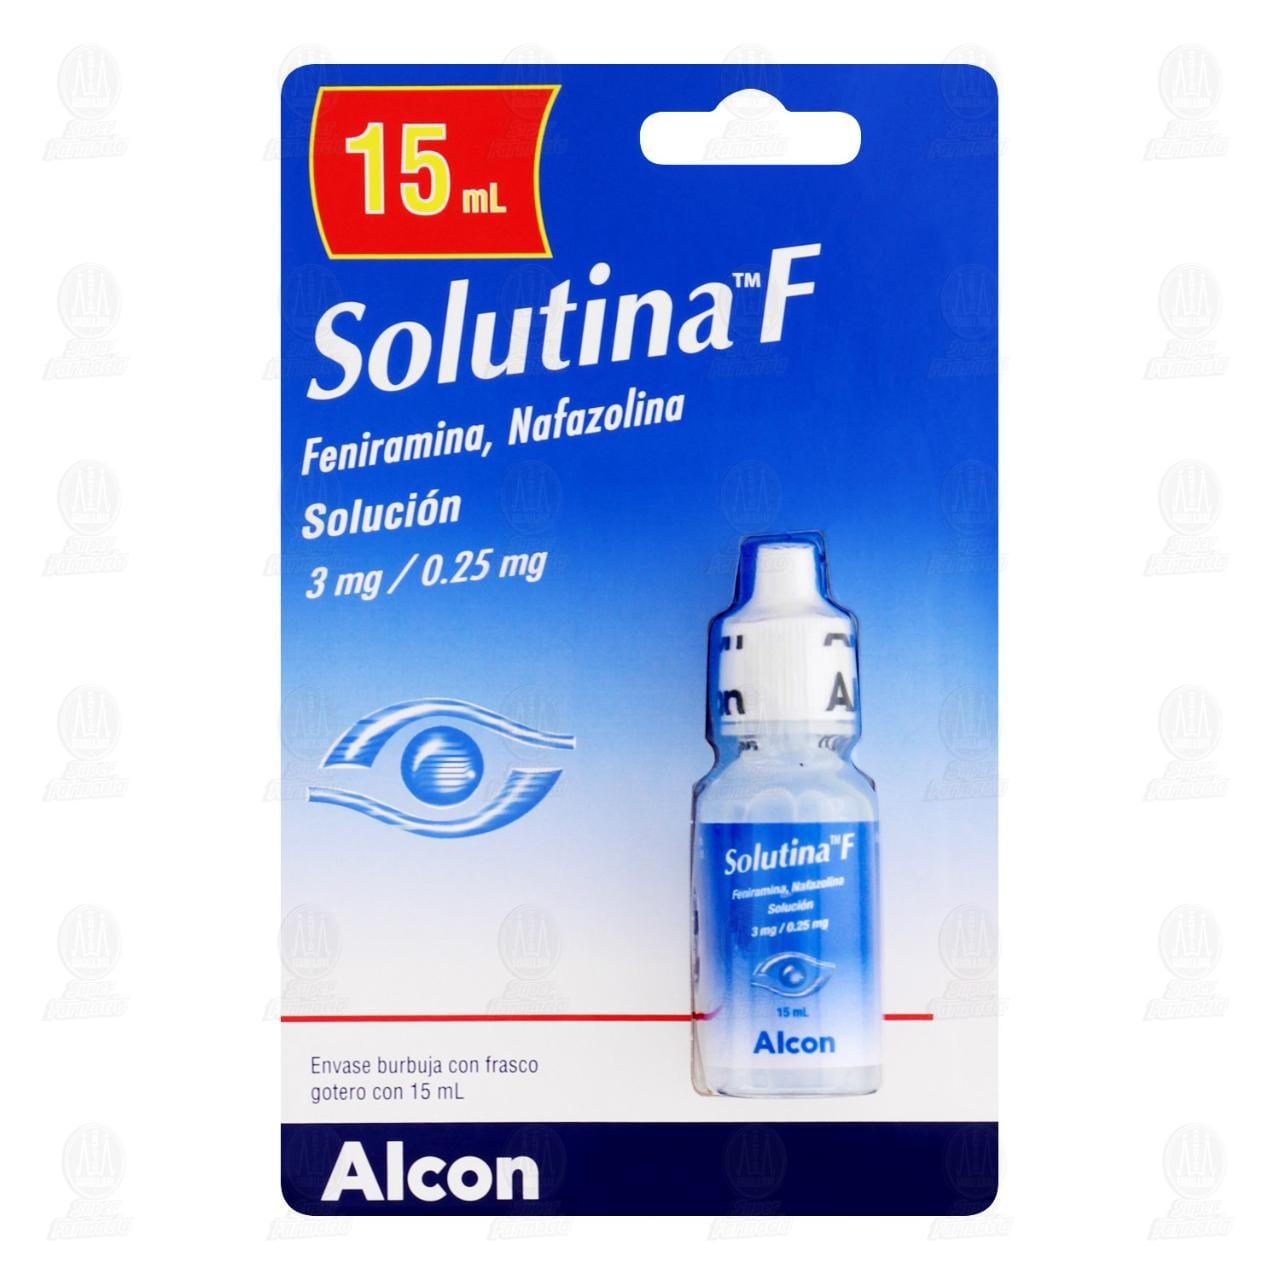 Comprar Solutina F Solución Oftálmica 15ml en Farmacias Guadalajara